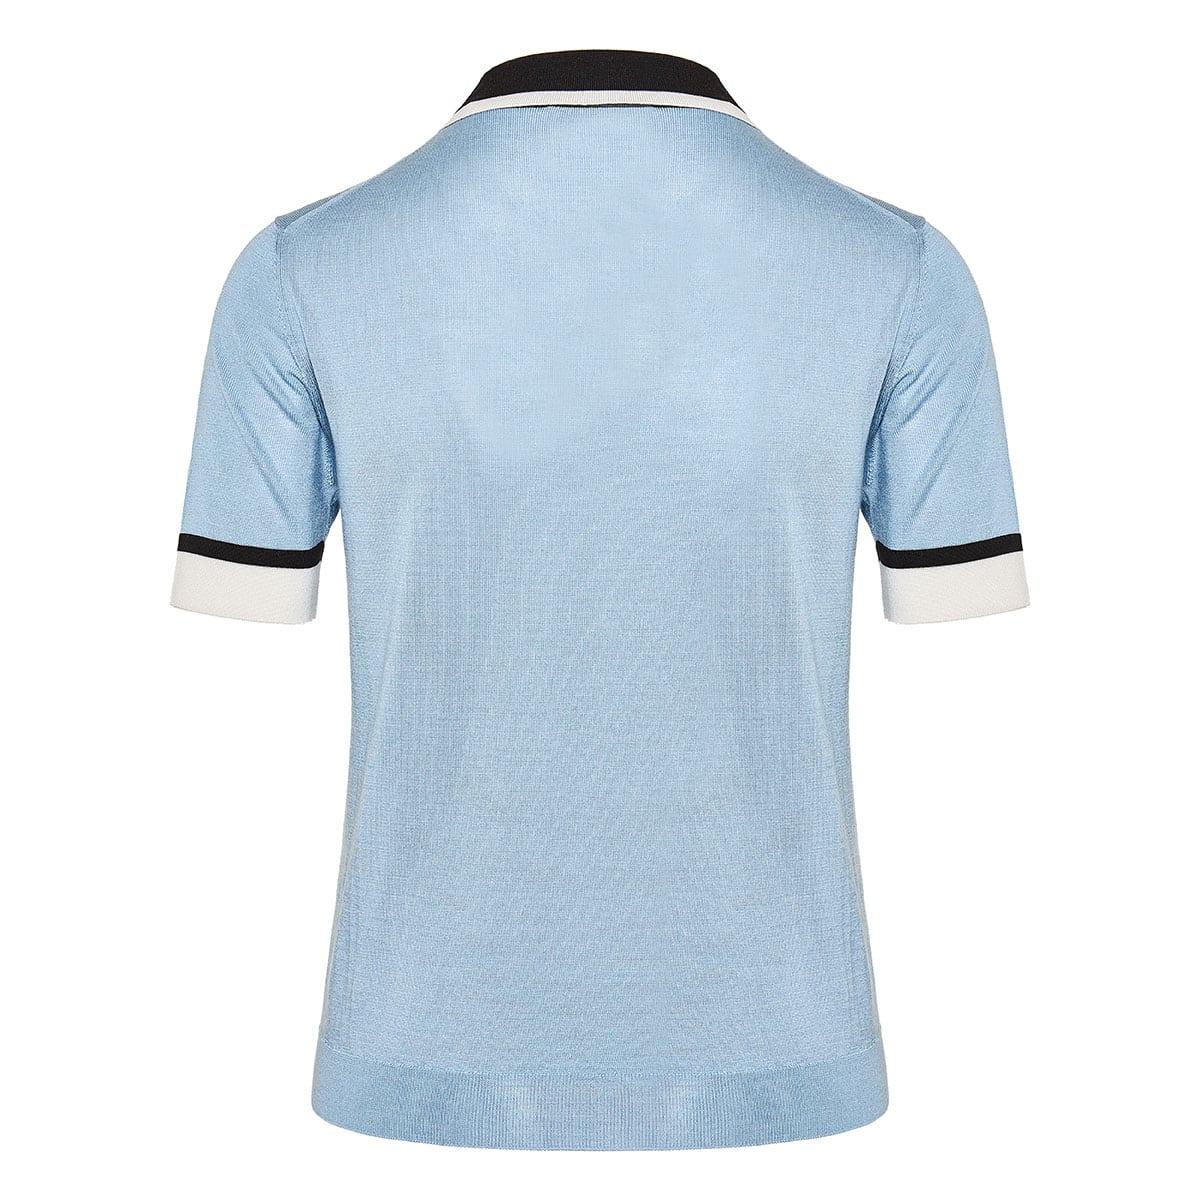 Silk polo shirt